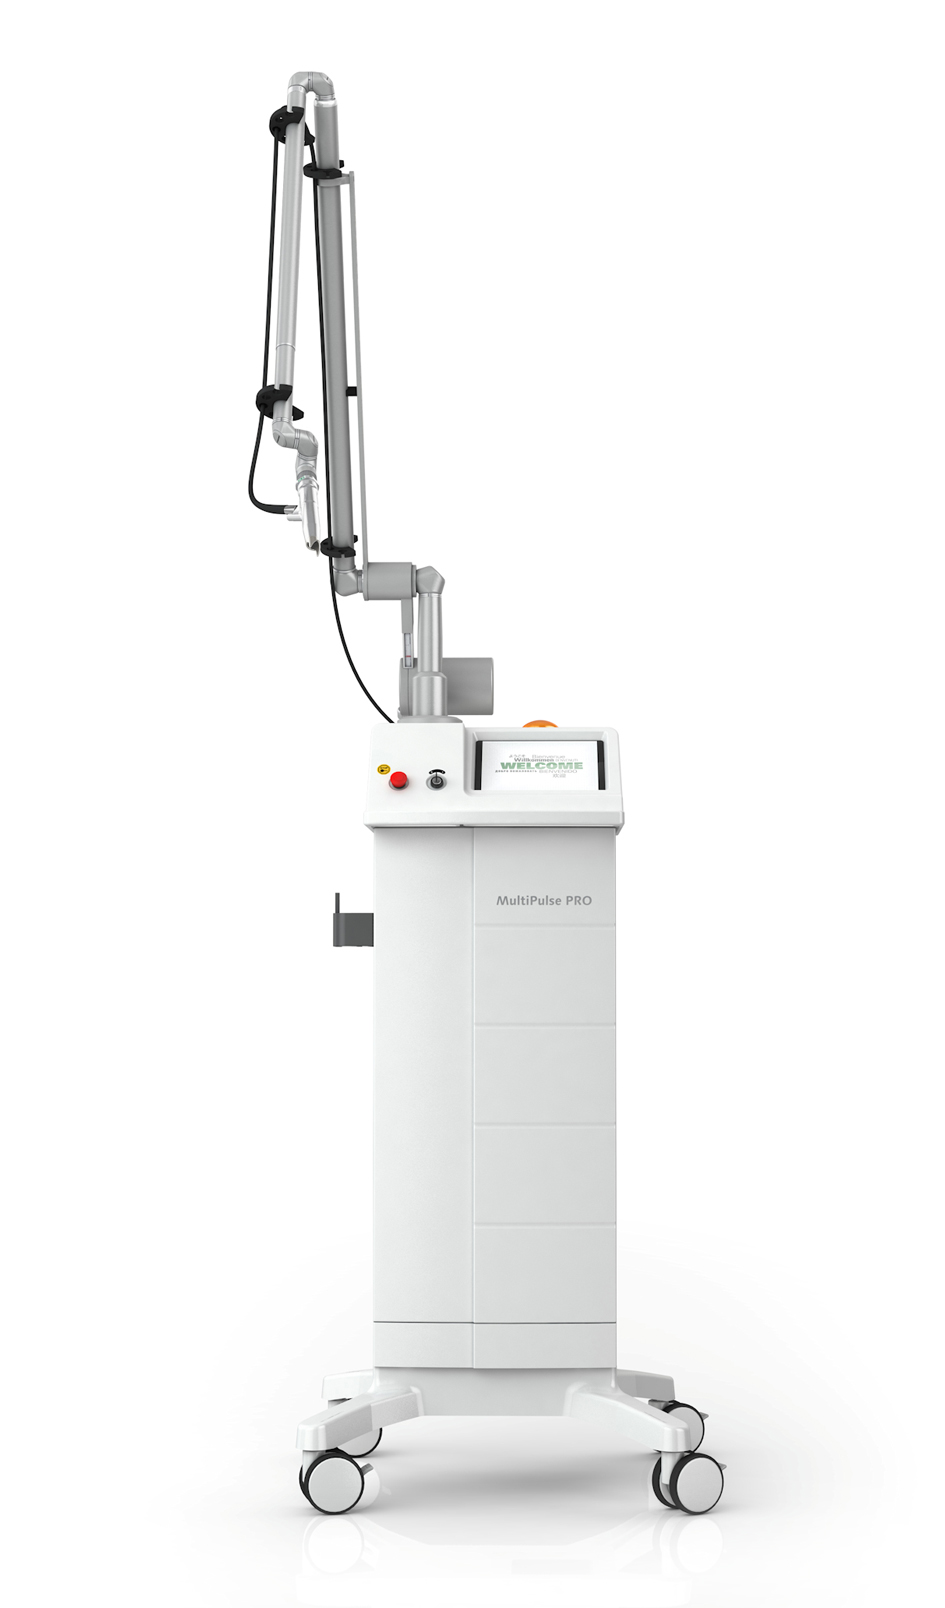 MultiPulse Pro Surgical CO2 Laser